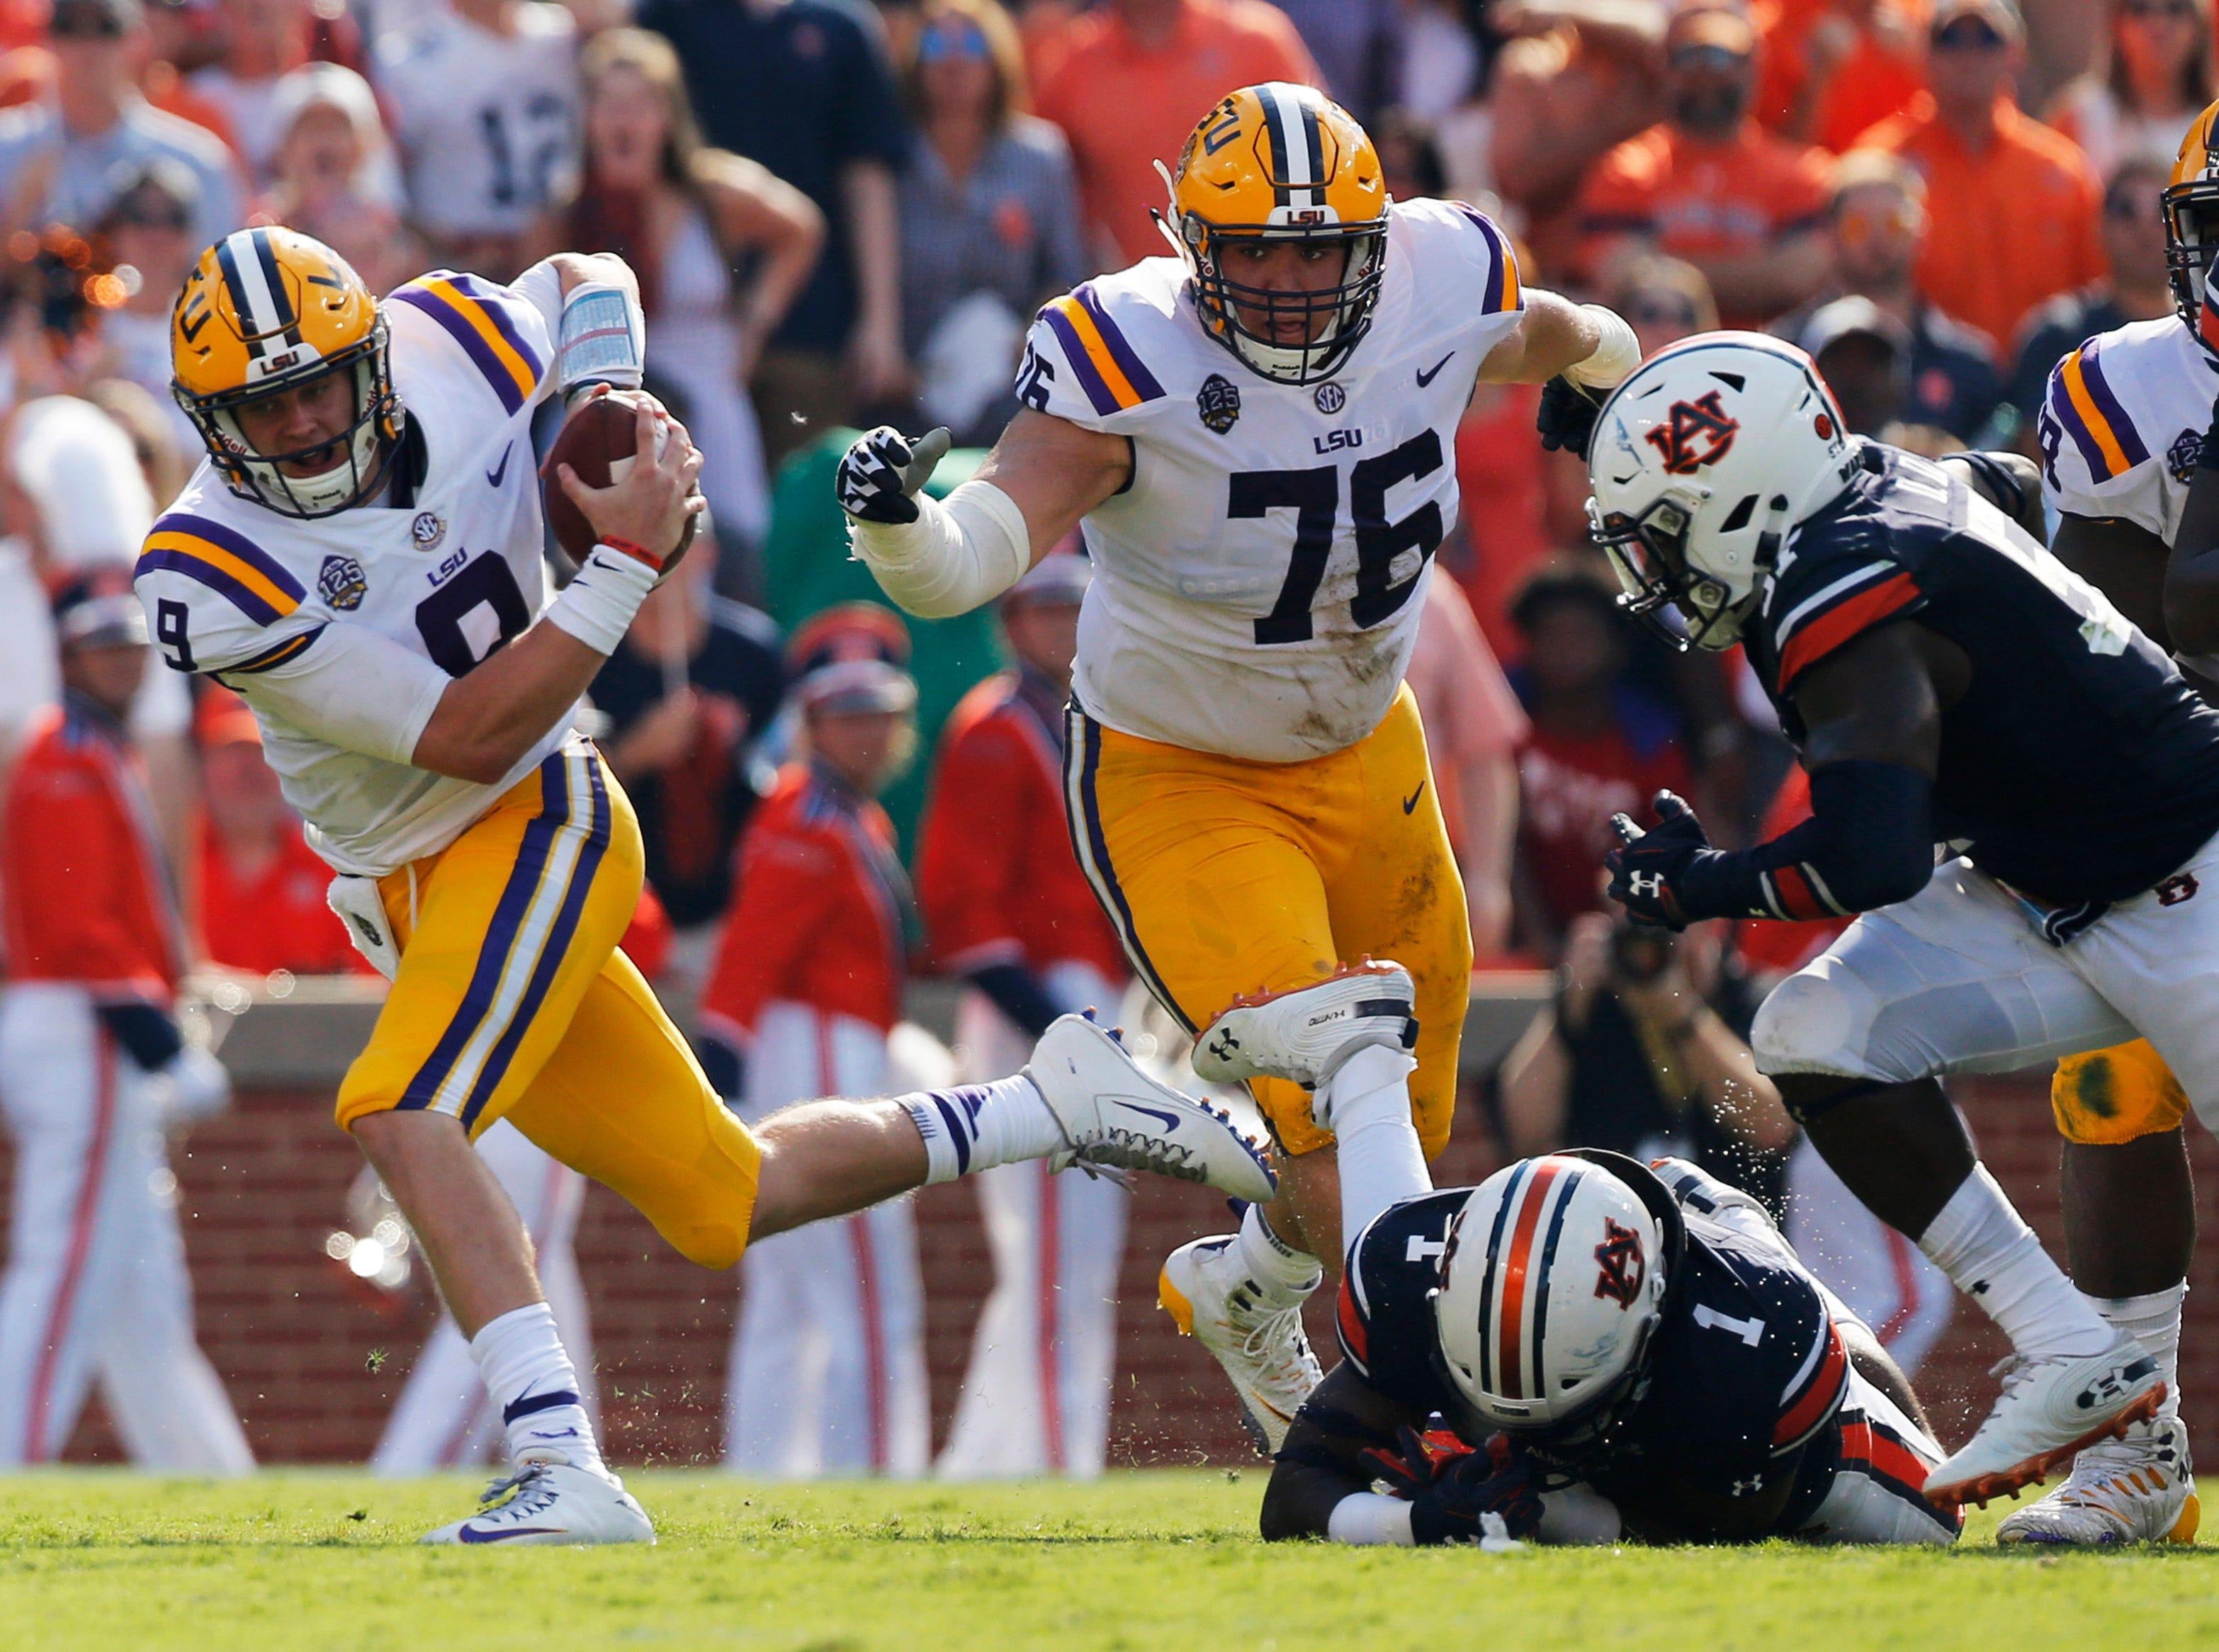 Sep 15, 2018; Auburn, AL, USA; LSU Tigers quarterback Joe Burrow (9) scrambles against the Auburn Tigers during the second quarter at Jordan-Hare Stadium. Mandatory Credit: John Reed-USA TODAY Sports